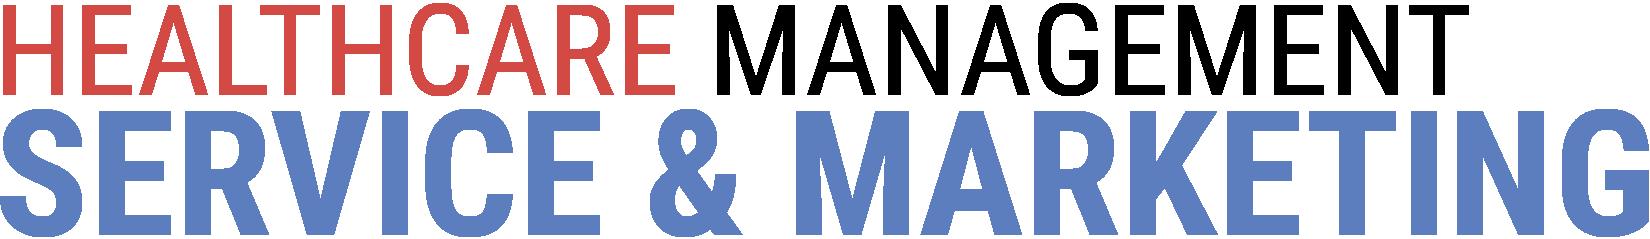 Медицинский менеджмент, сервис и маркетинг